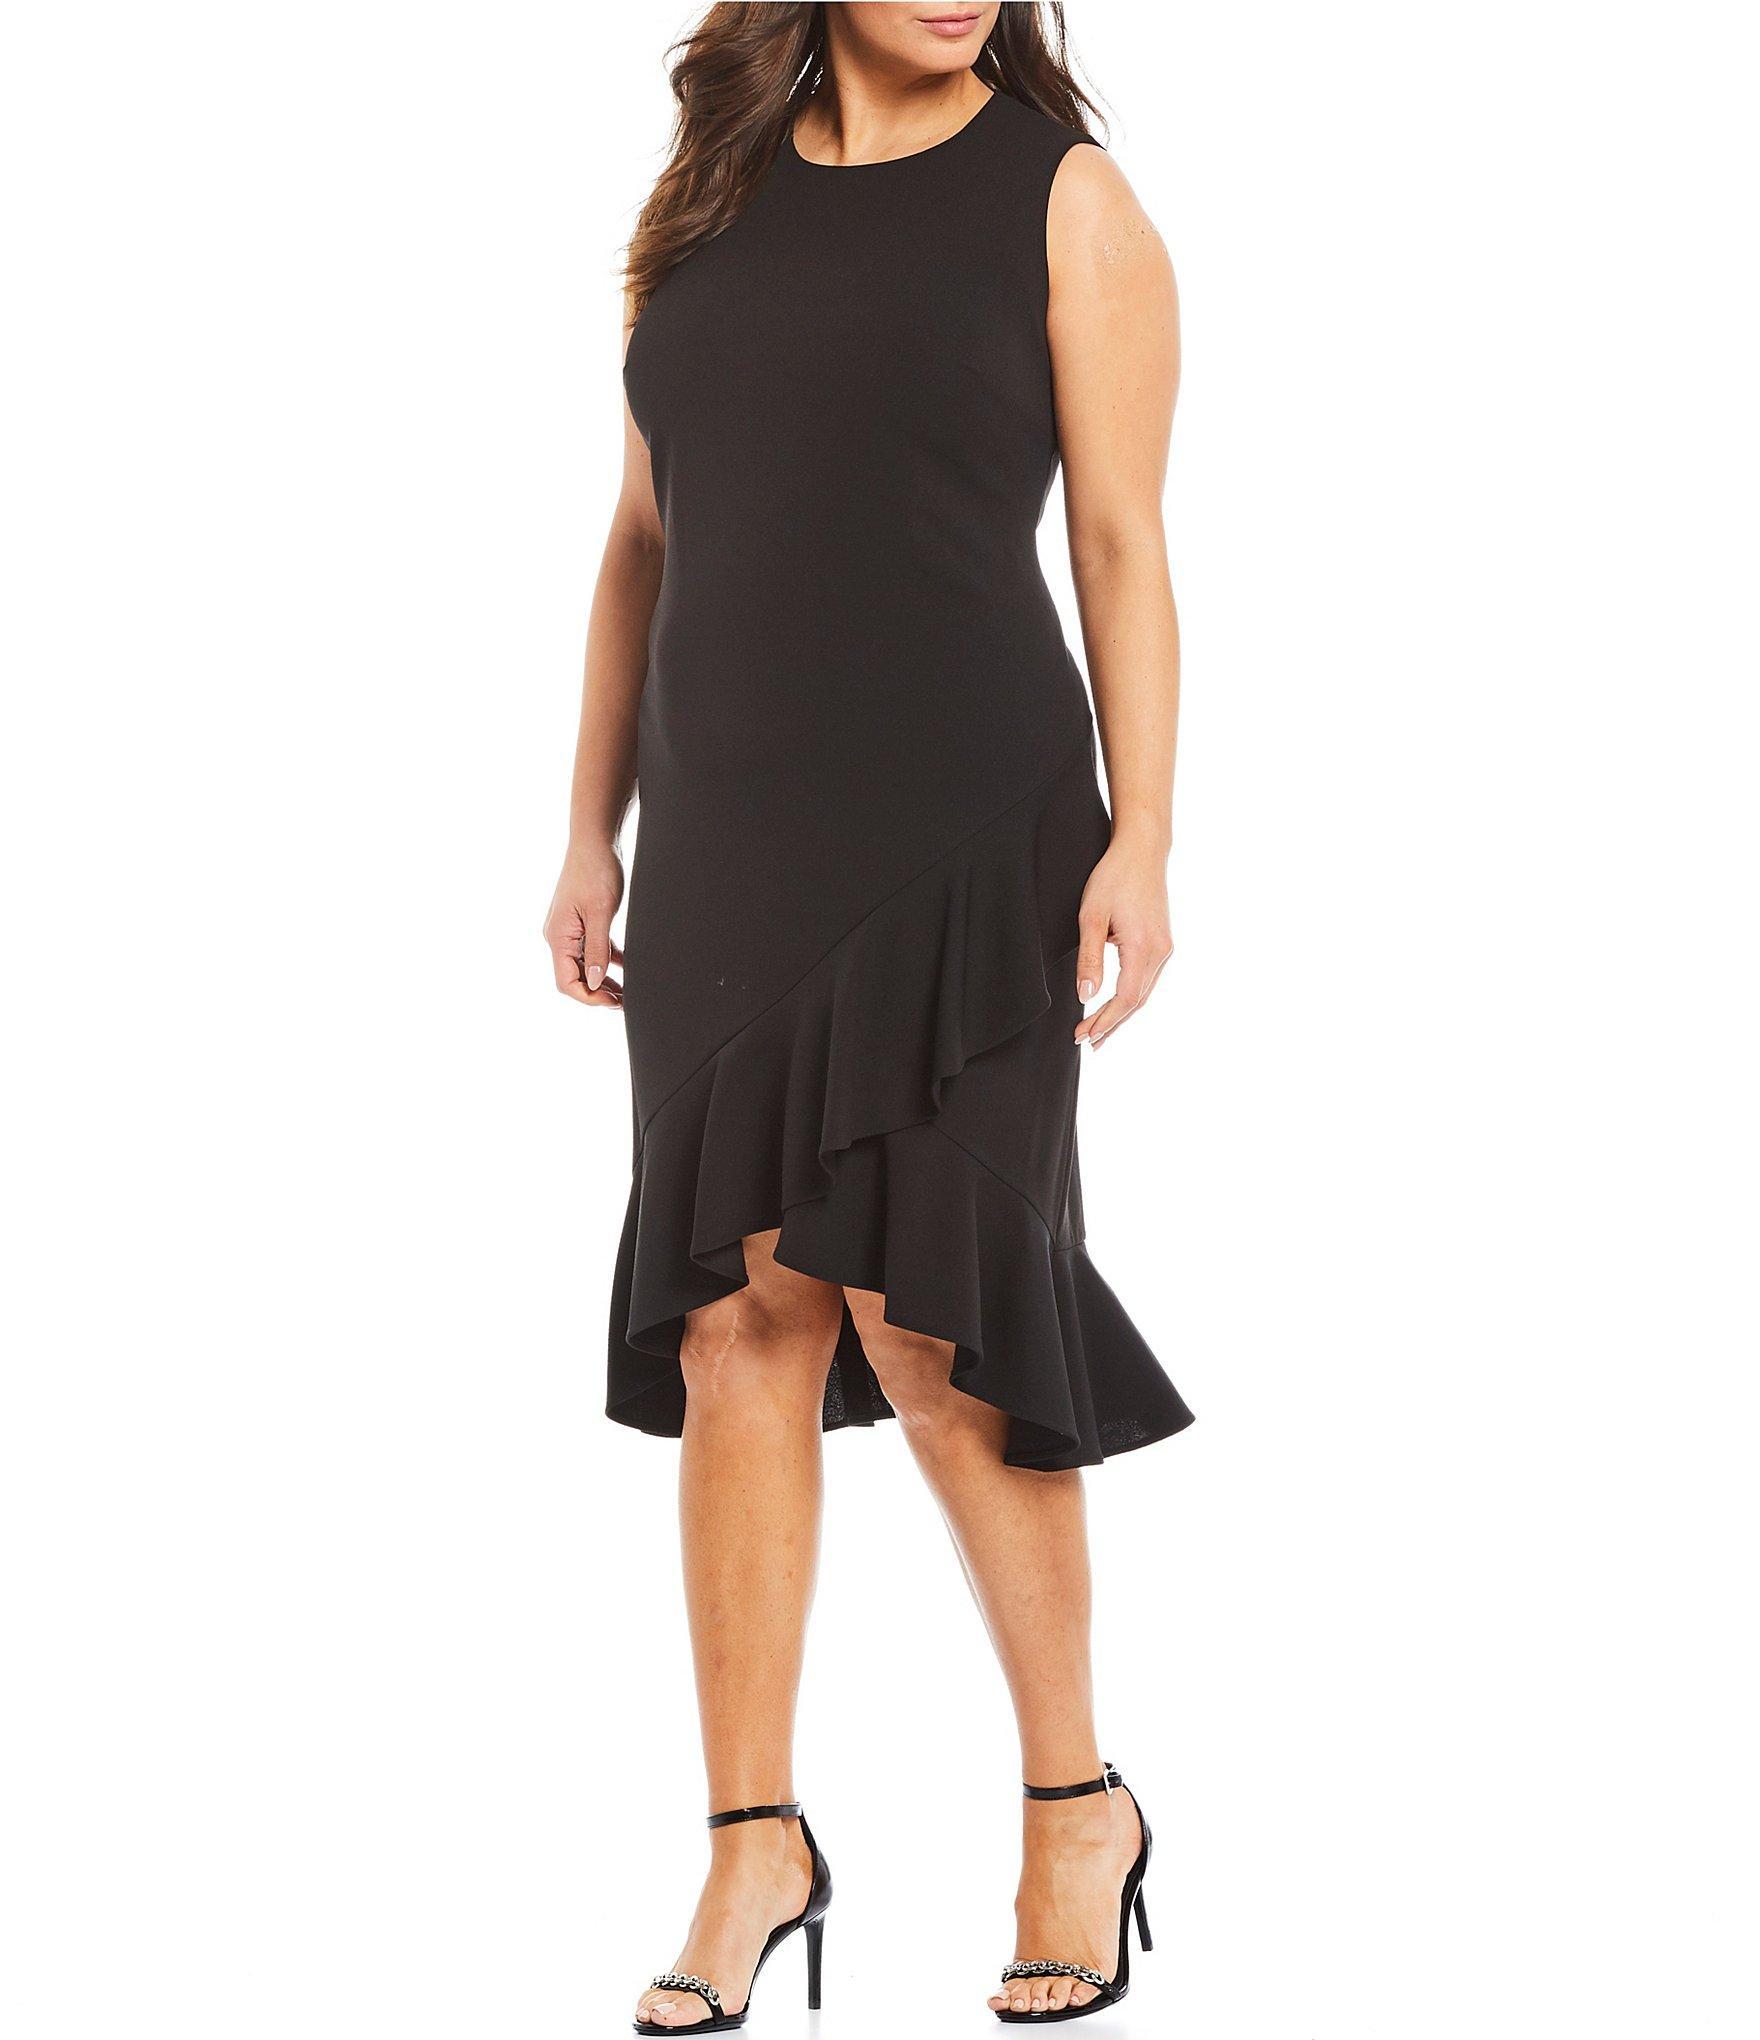 ad5c89034a3 Calvin Klein. Women s Black Plus Size Sleeveless Asymmetrical Ruffle Sheath  Midi Dress